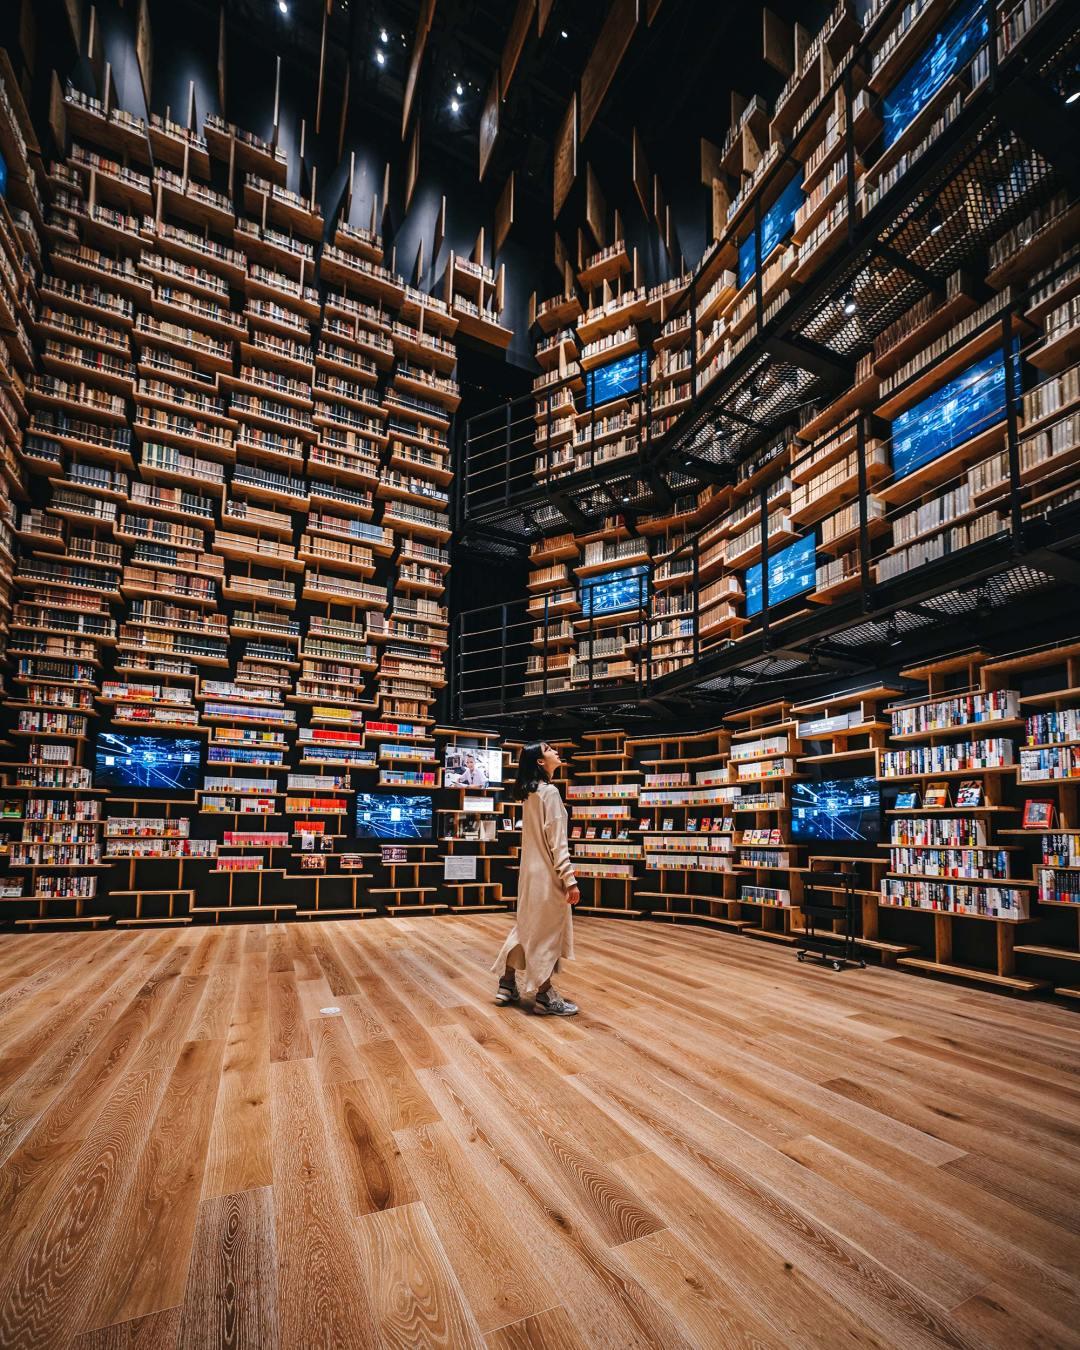 Tokyo's Kadokawa Culture Museum Houses an Arresting Kengo Kuma-Designed Bookshelf Theater